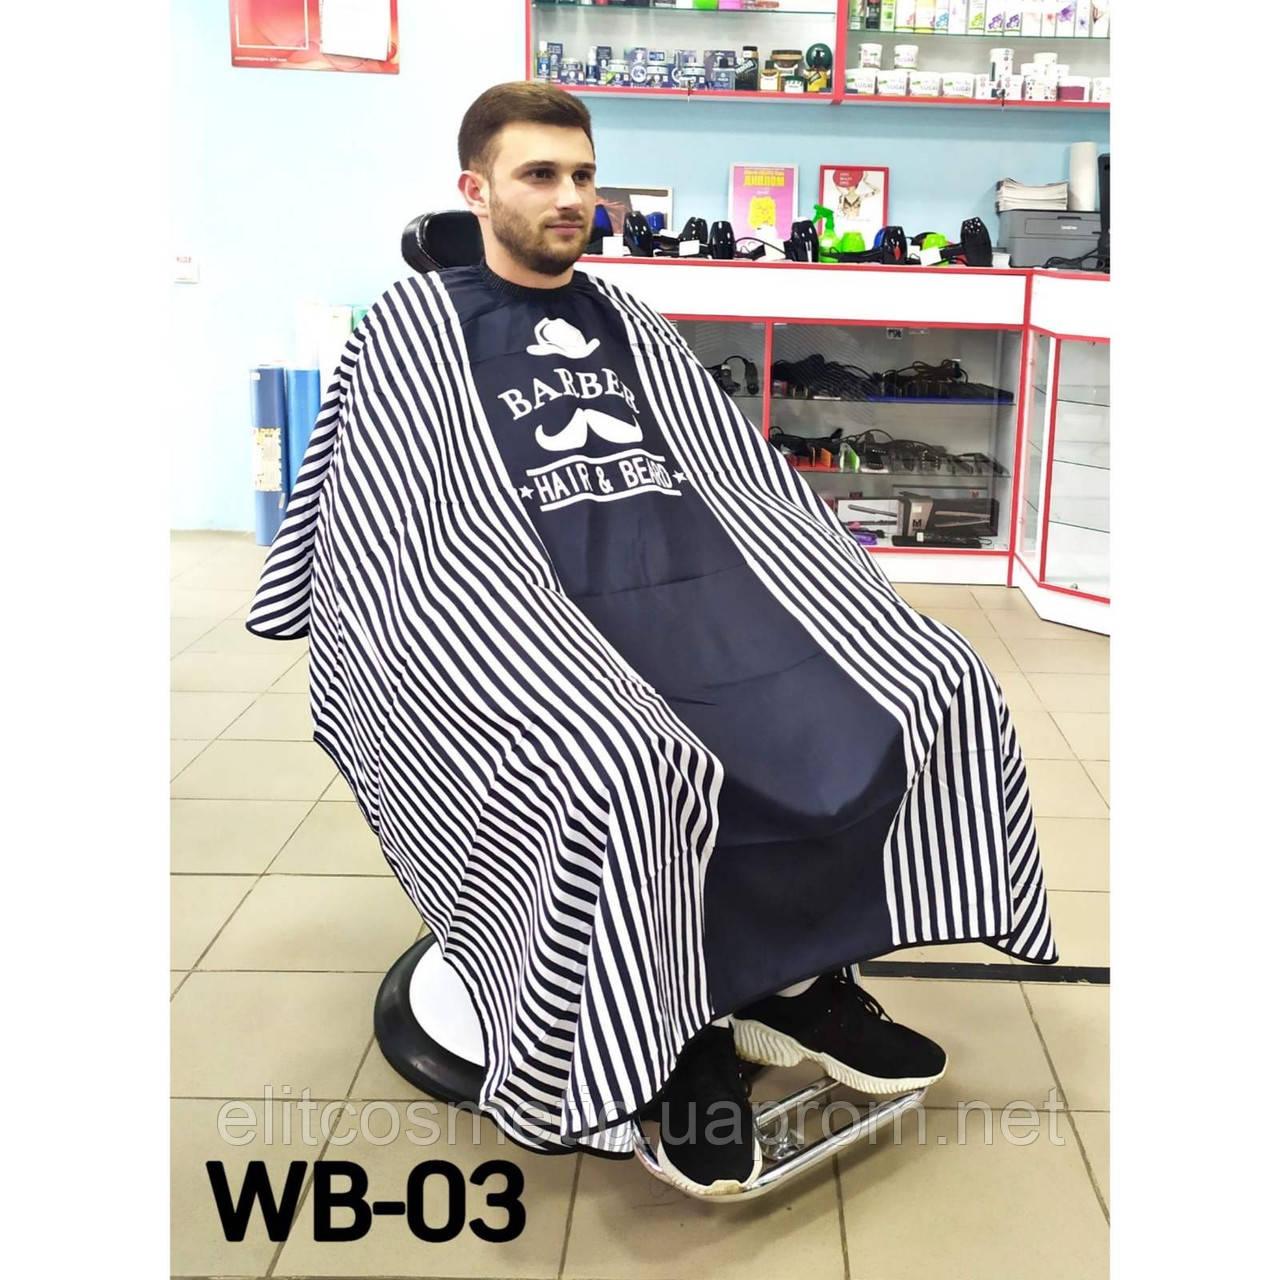 Пеньюар парикмахерский барбер WB-03